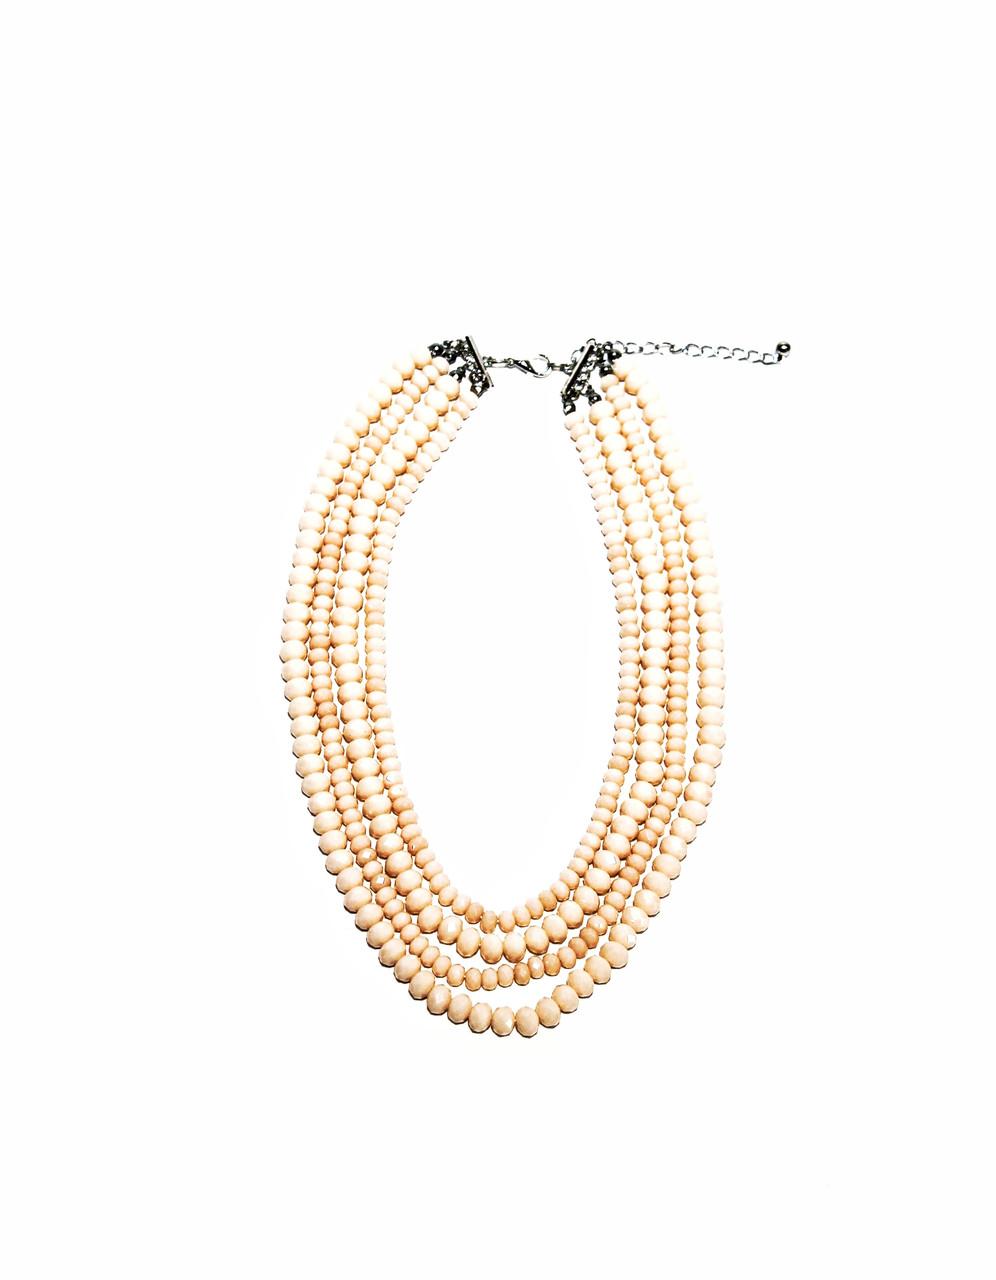 Колье розовые бусы  Brosh Jewellery. Тренд 2020г